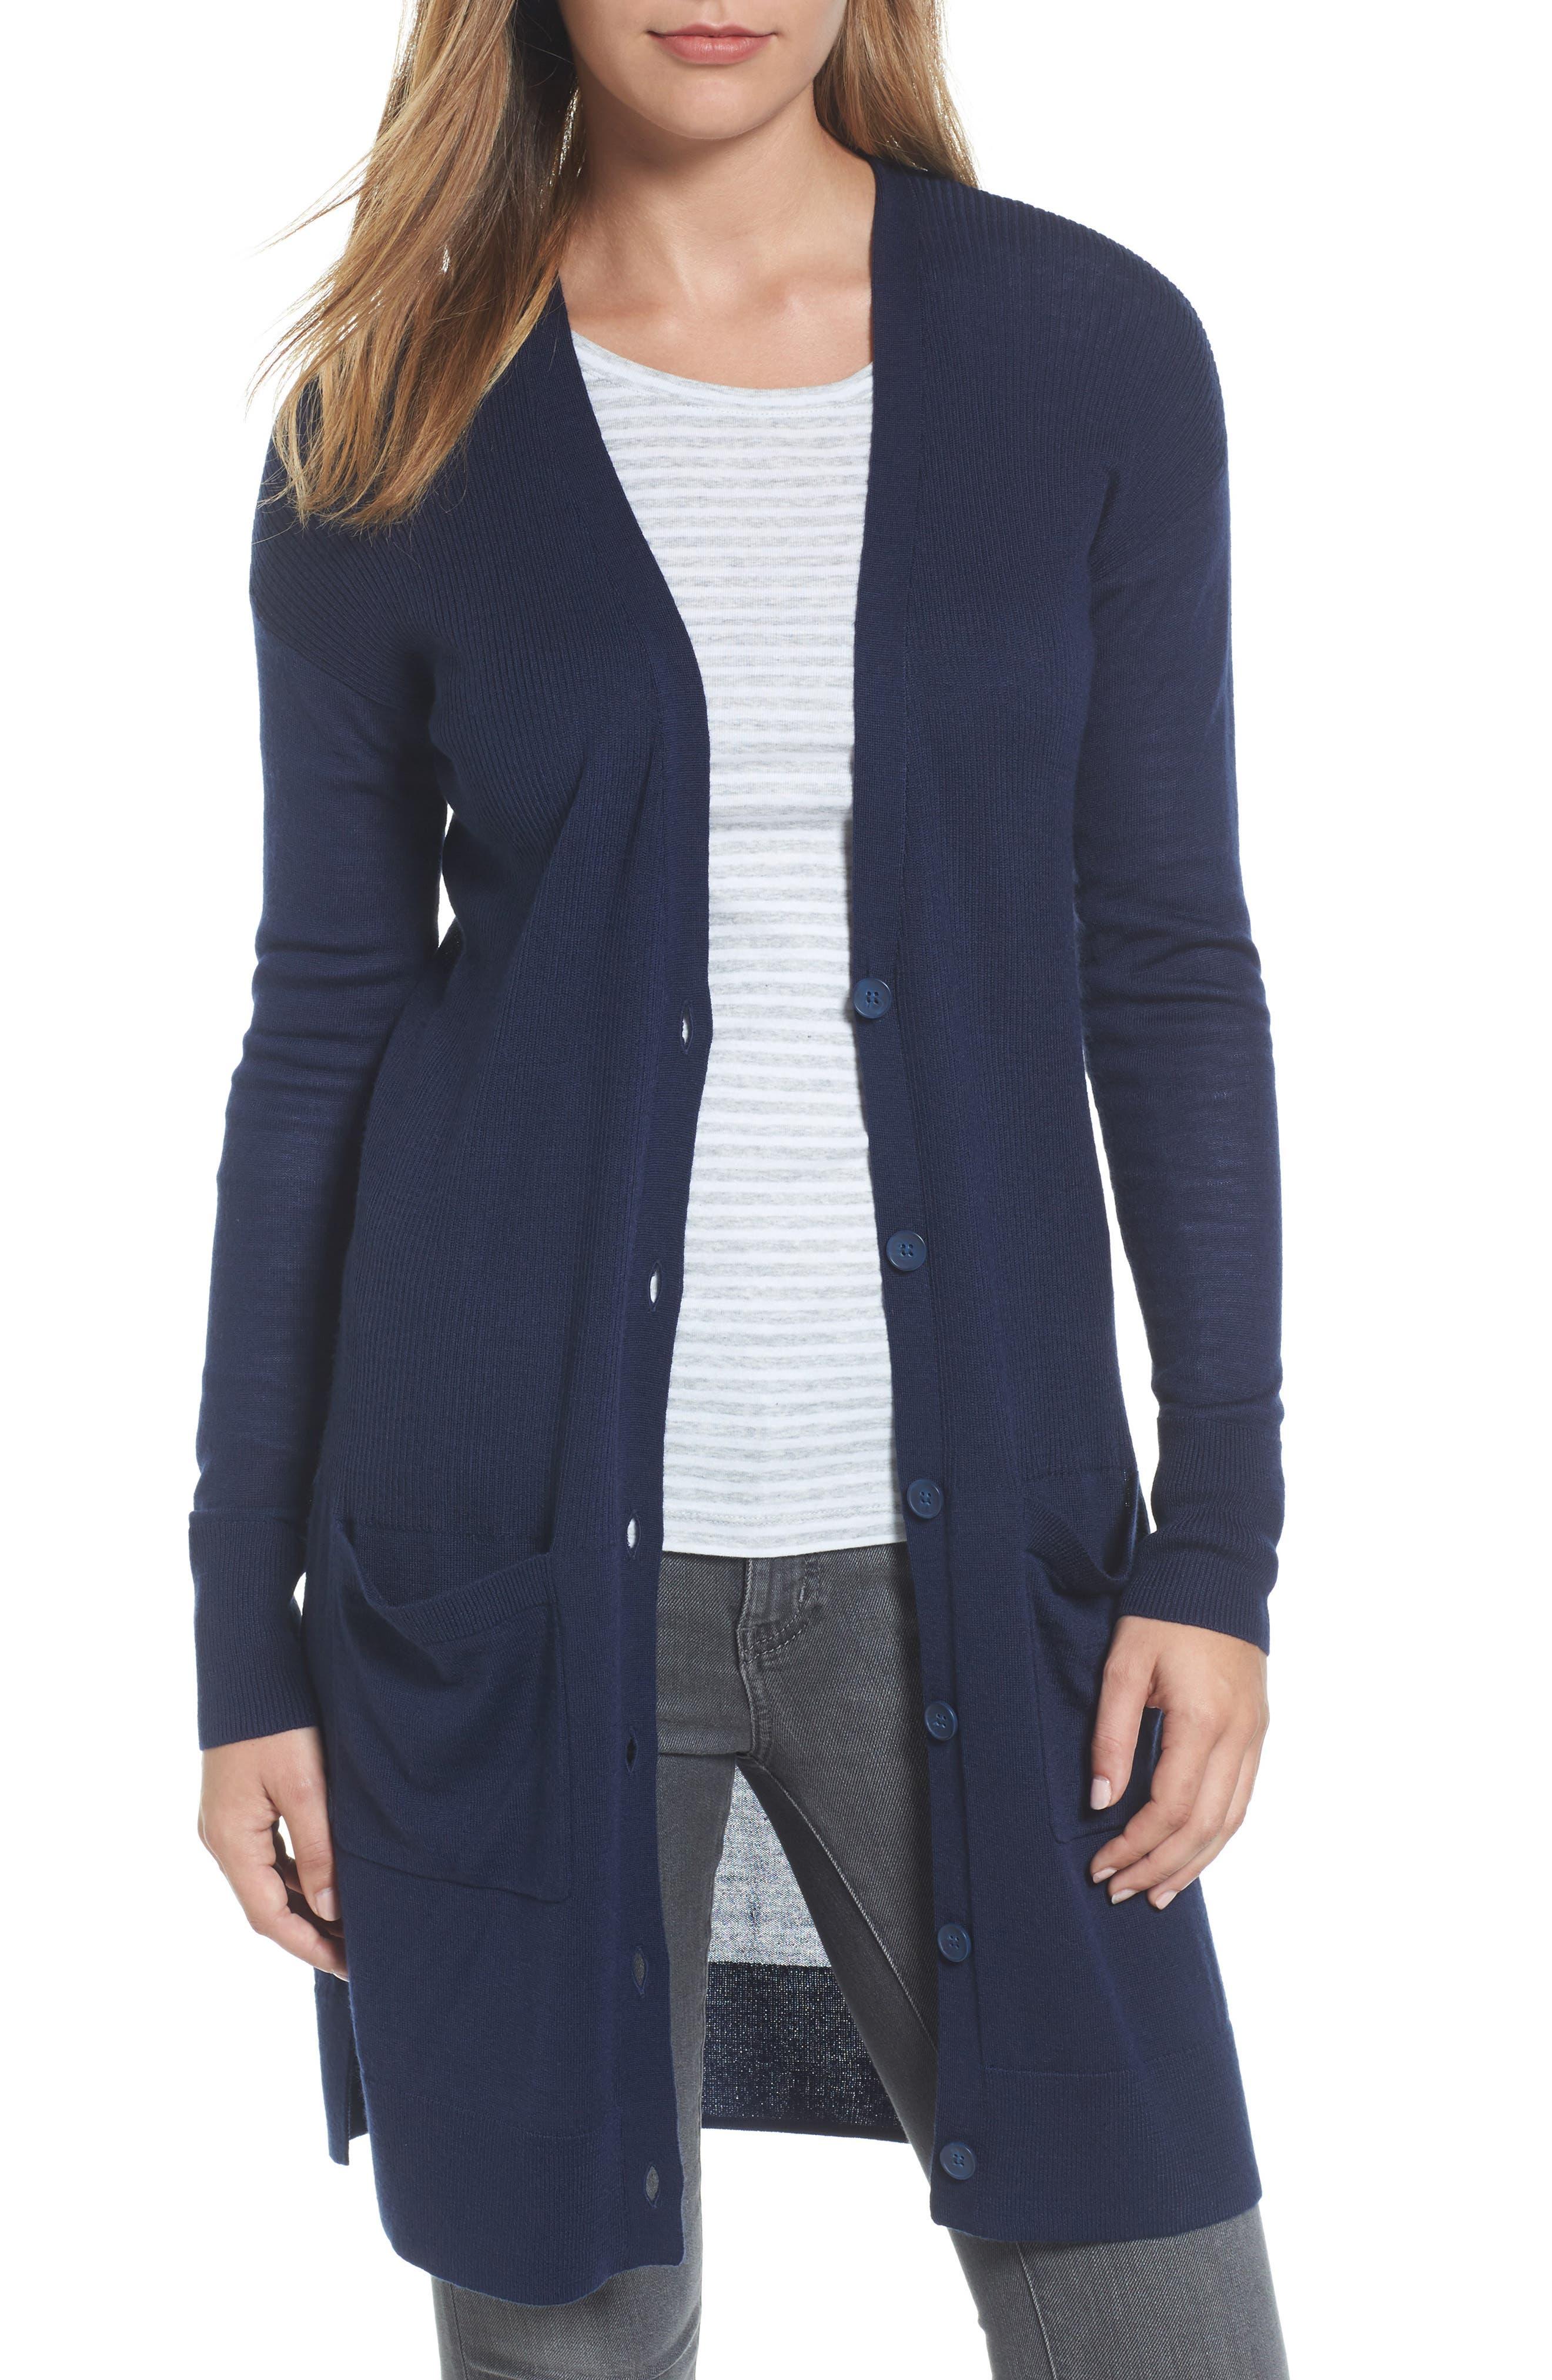 Alternate Image 1 Selected - Halogen® Rib Knit Wool Blend Cardigan (Regular & Petite)